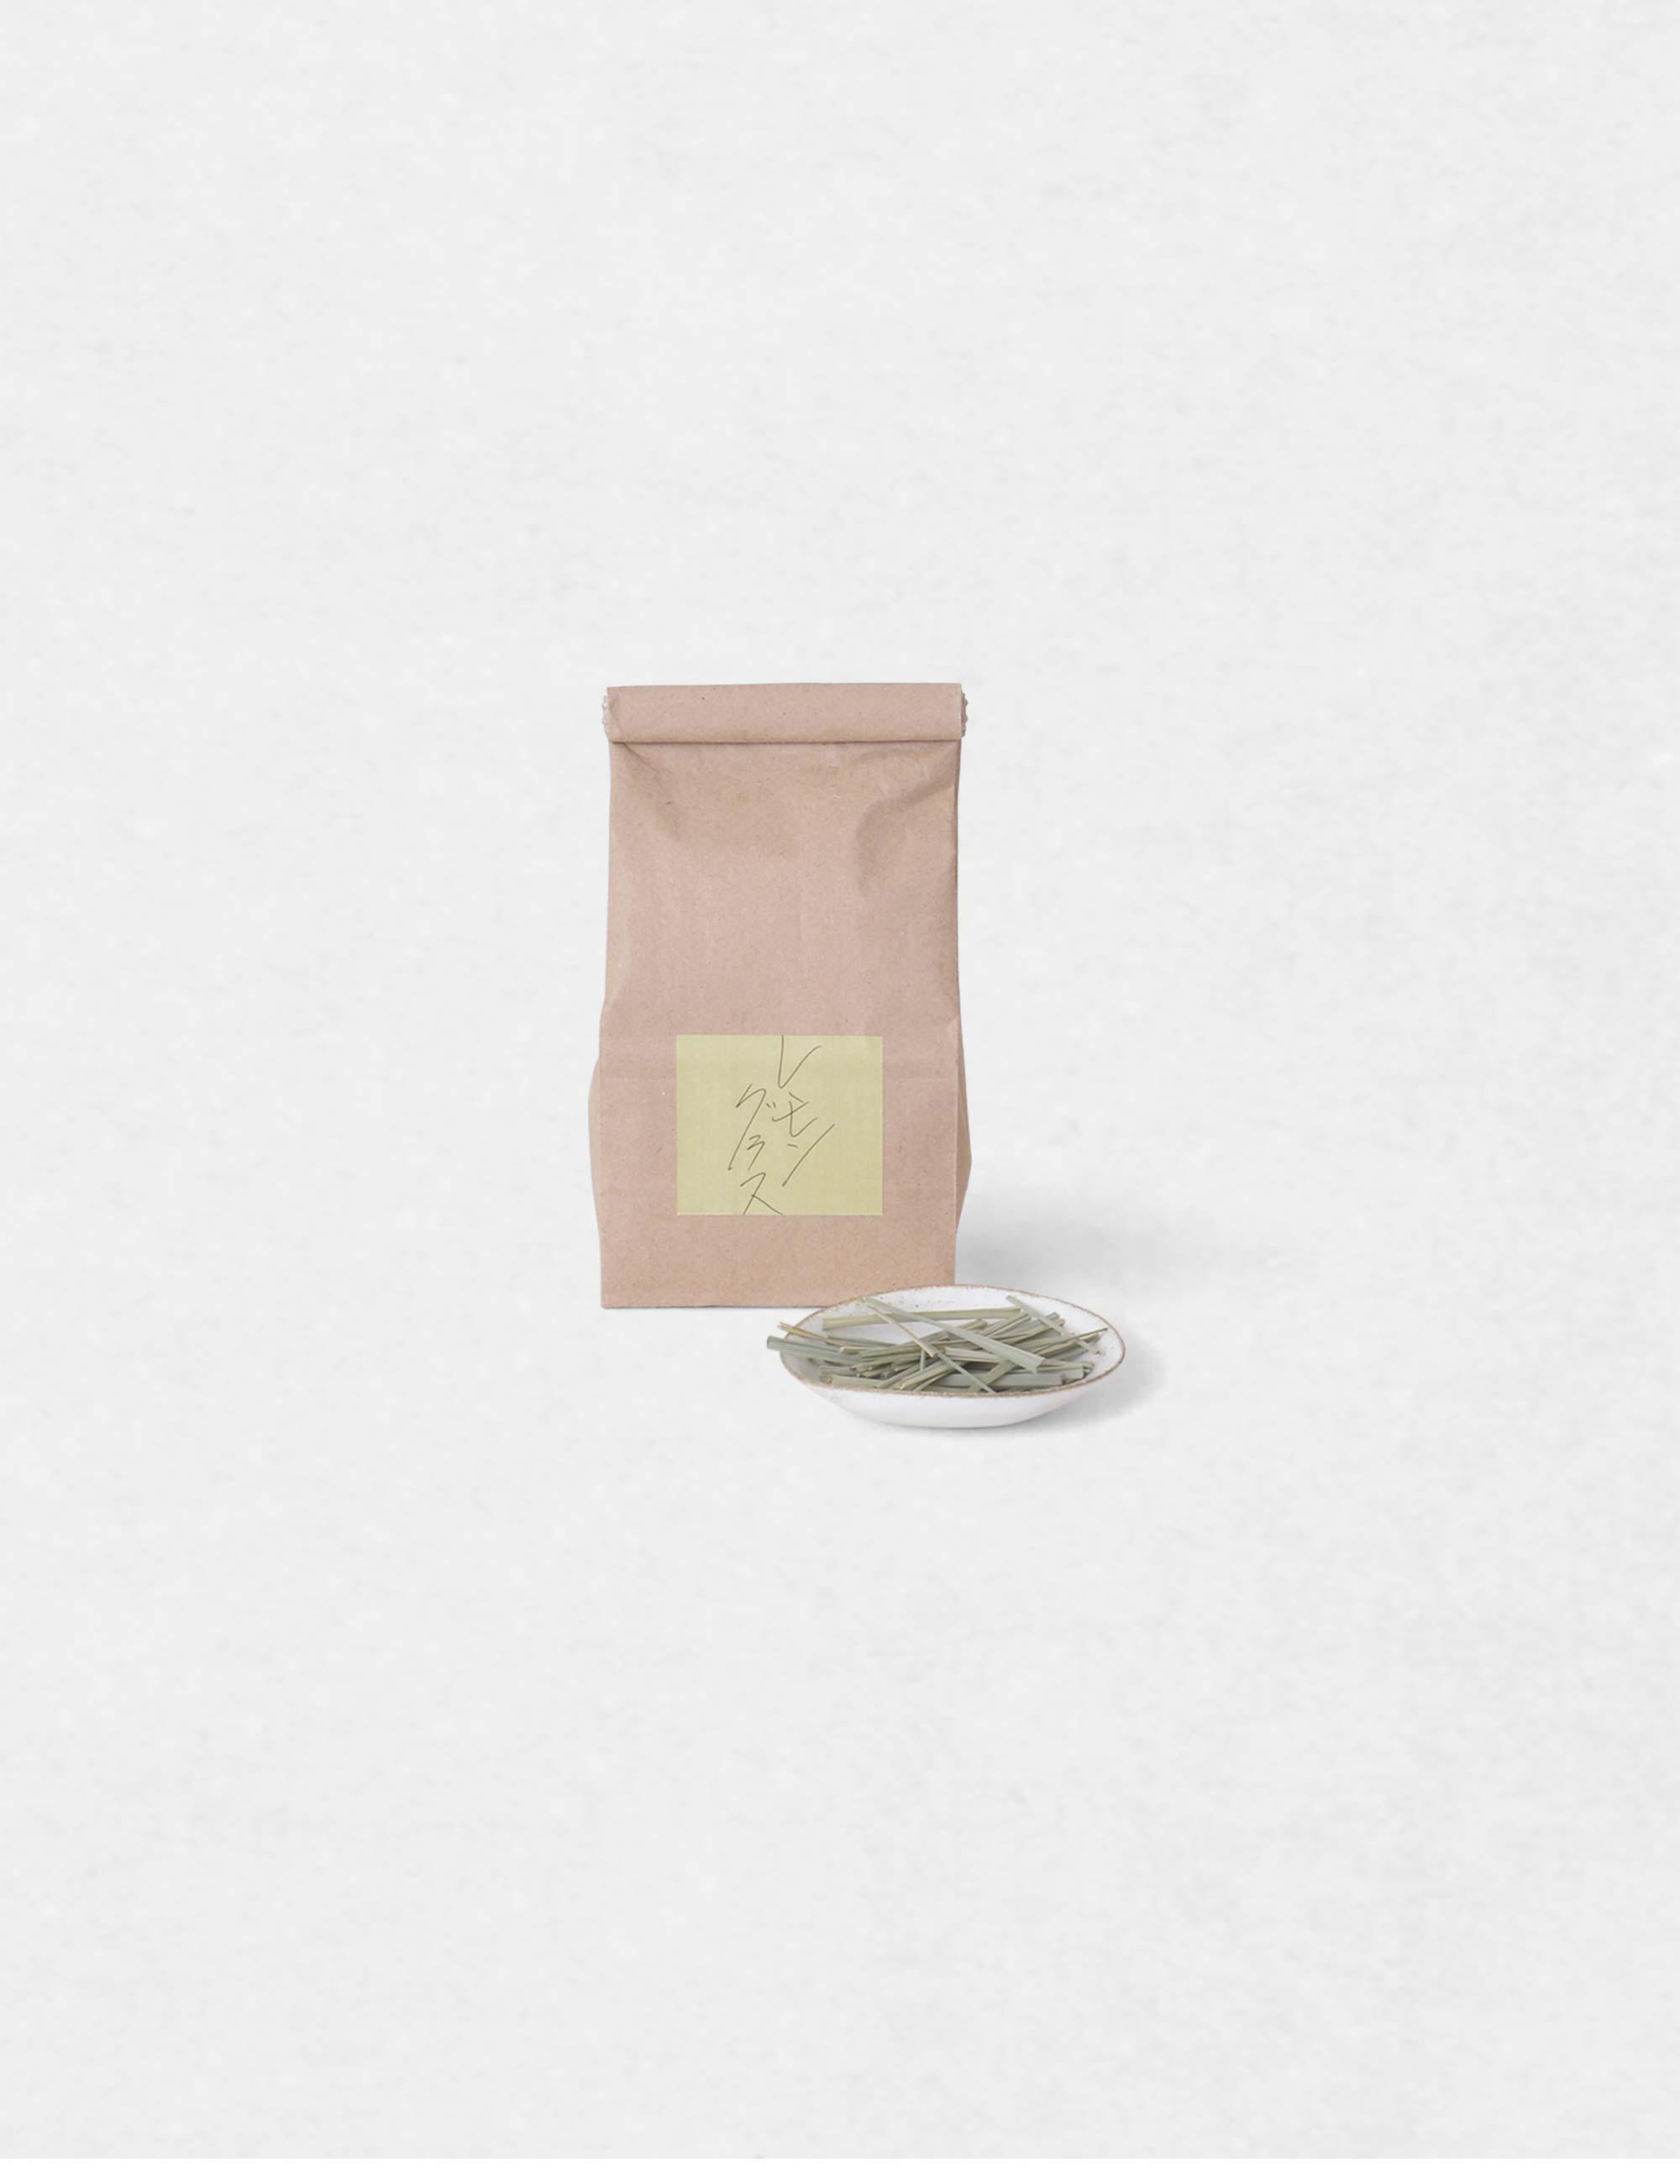 Jurgen Lehl Lemon Grass Tea